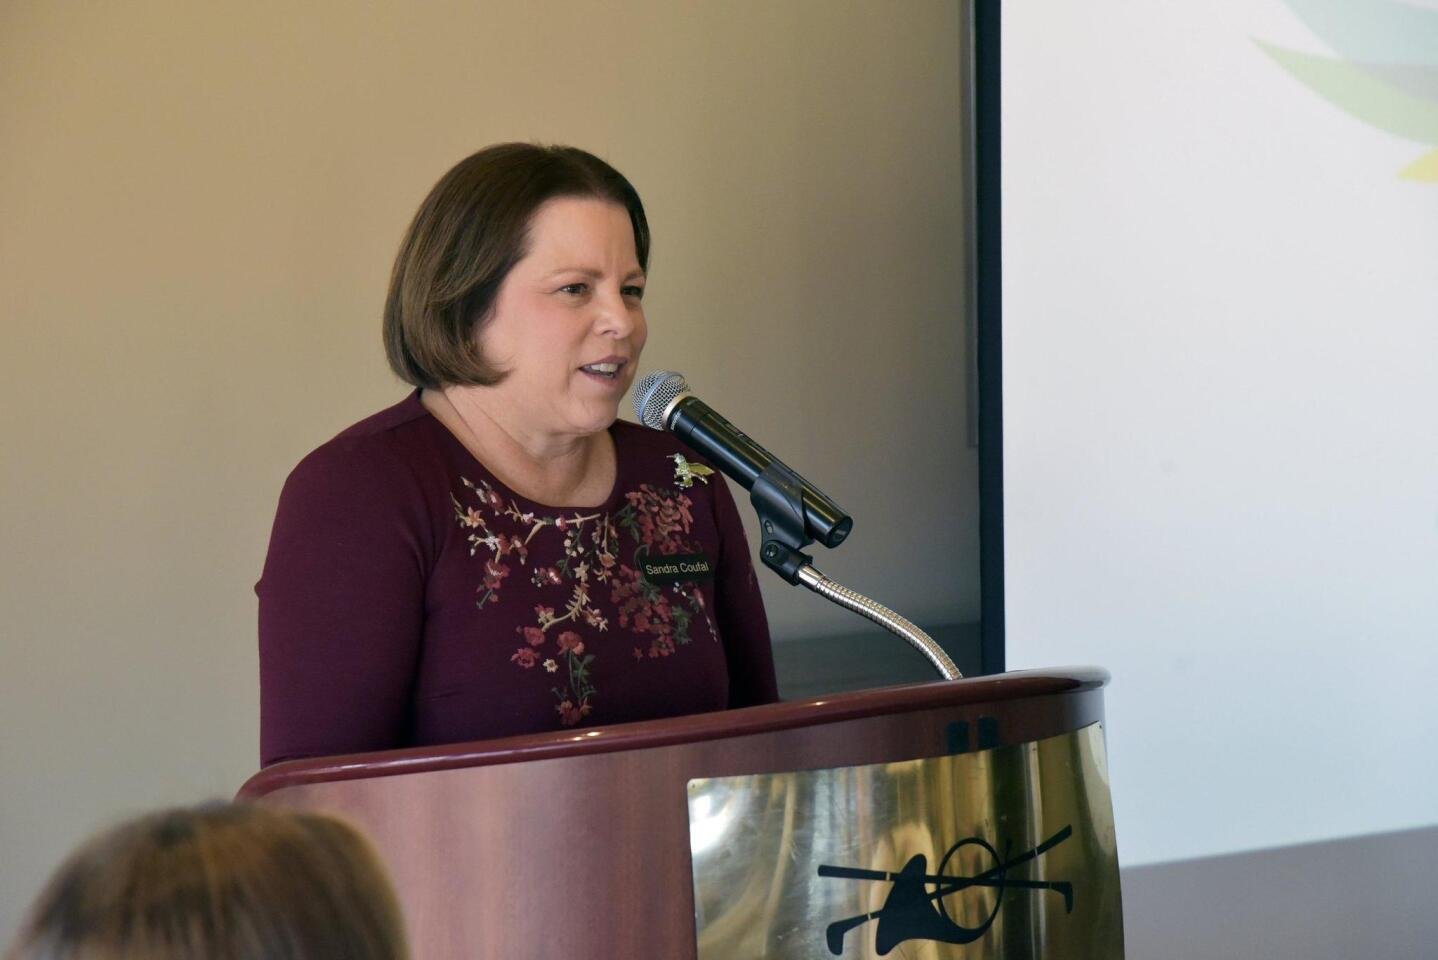 Rancho Santa Fe Women's Fund President Dr. Sandra Coufal